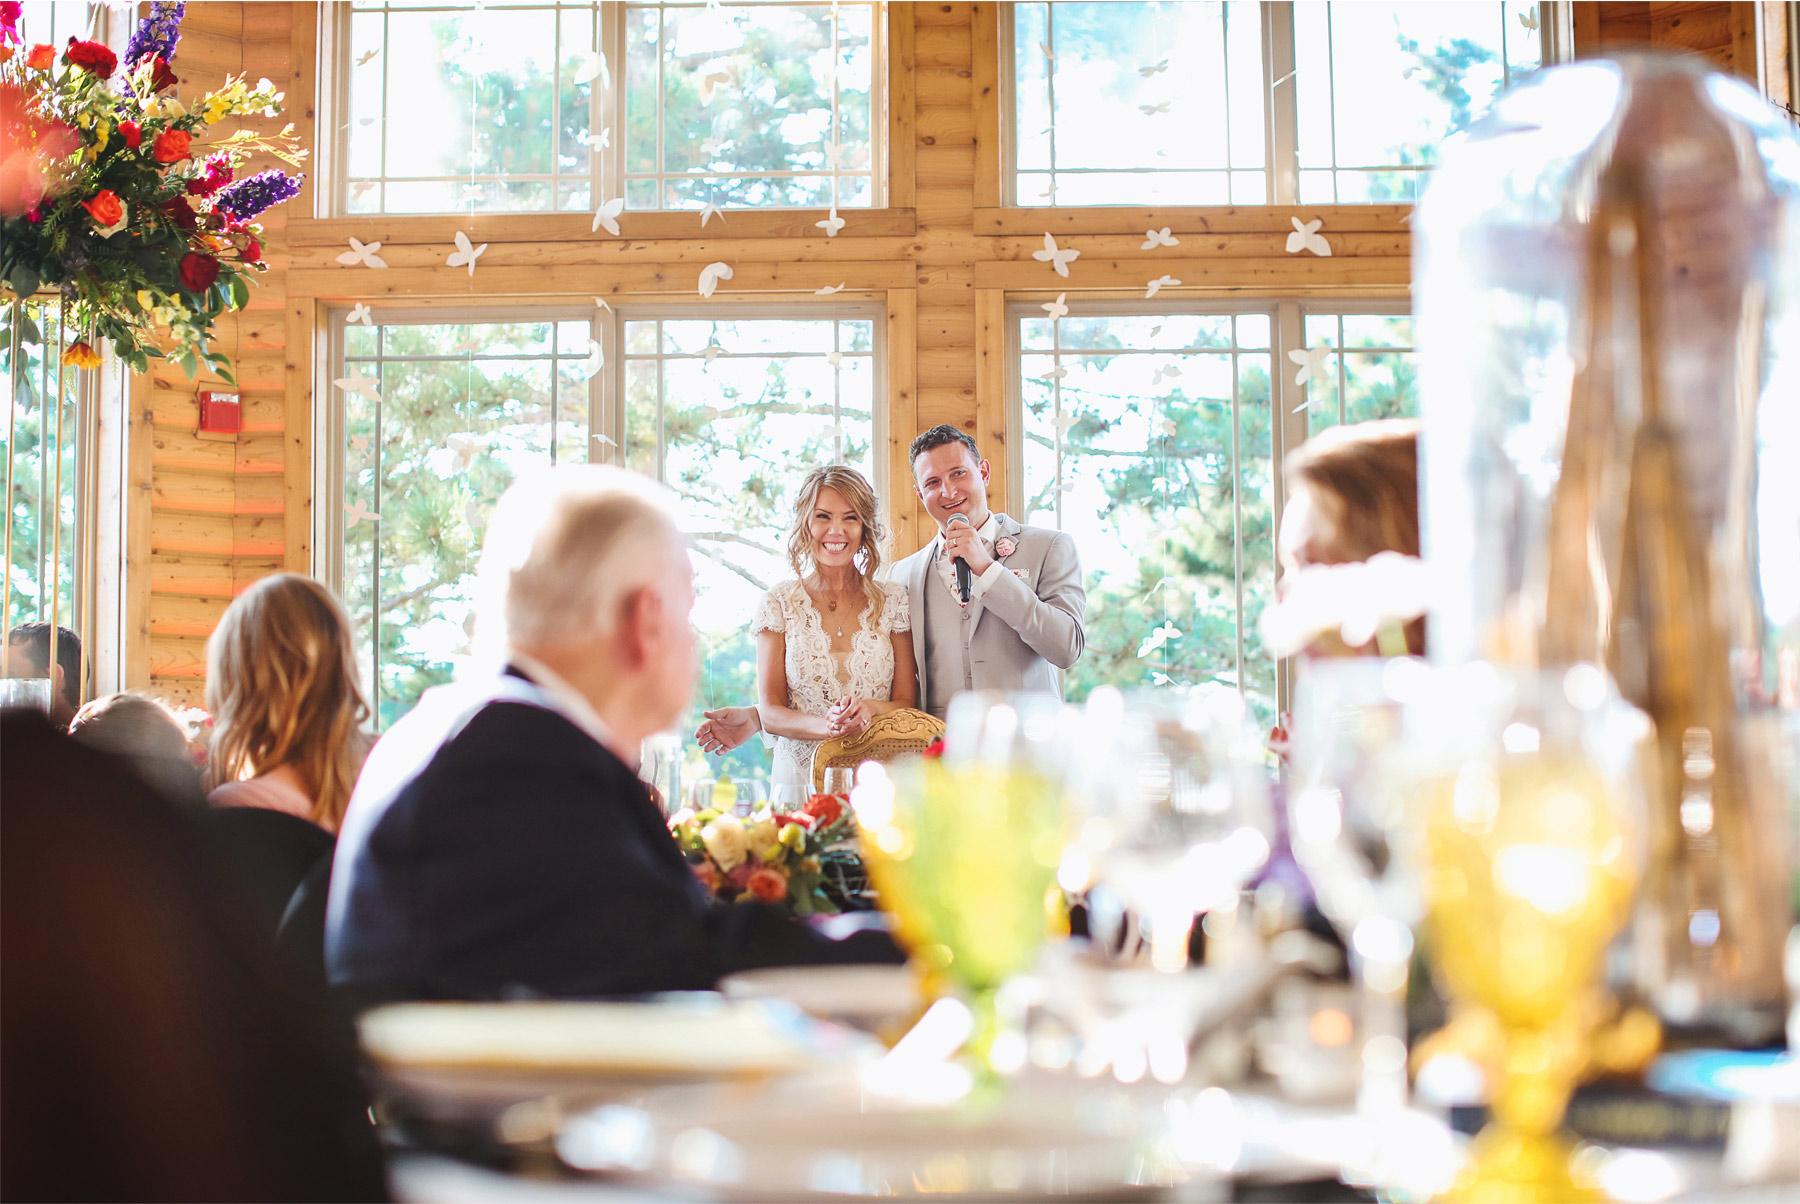 24-Vick-Photography-Wedding-Ottertail-Minnesota-Alice-in-Wonderland-Theme-Reception-Bride-Groom-Toast-Tess-and-Greg.jpg